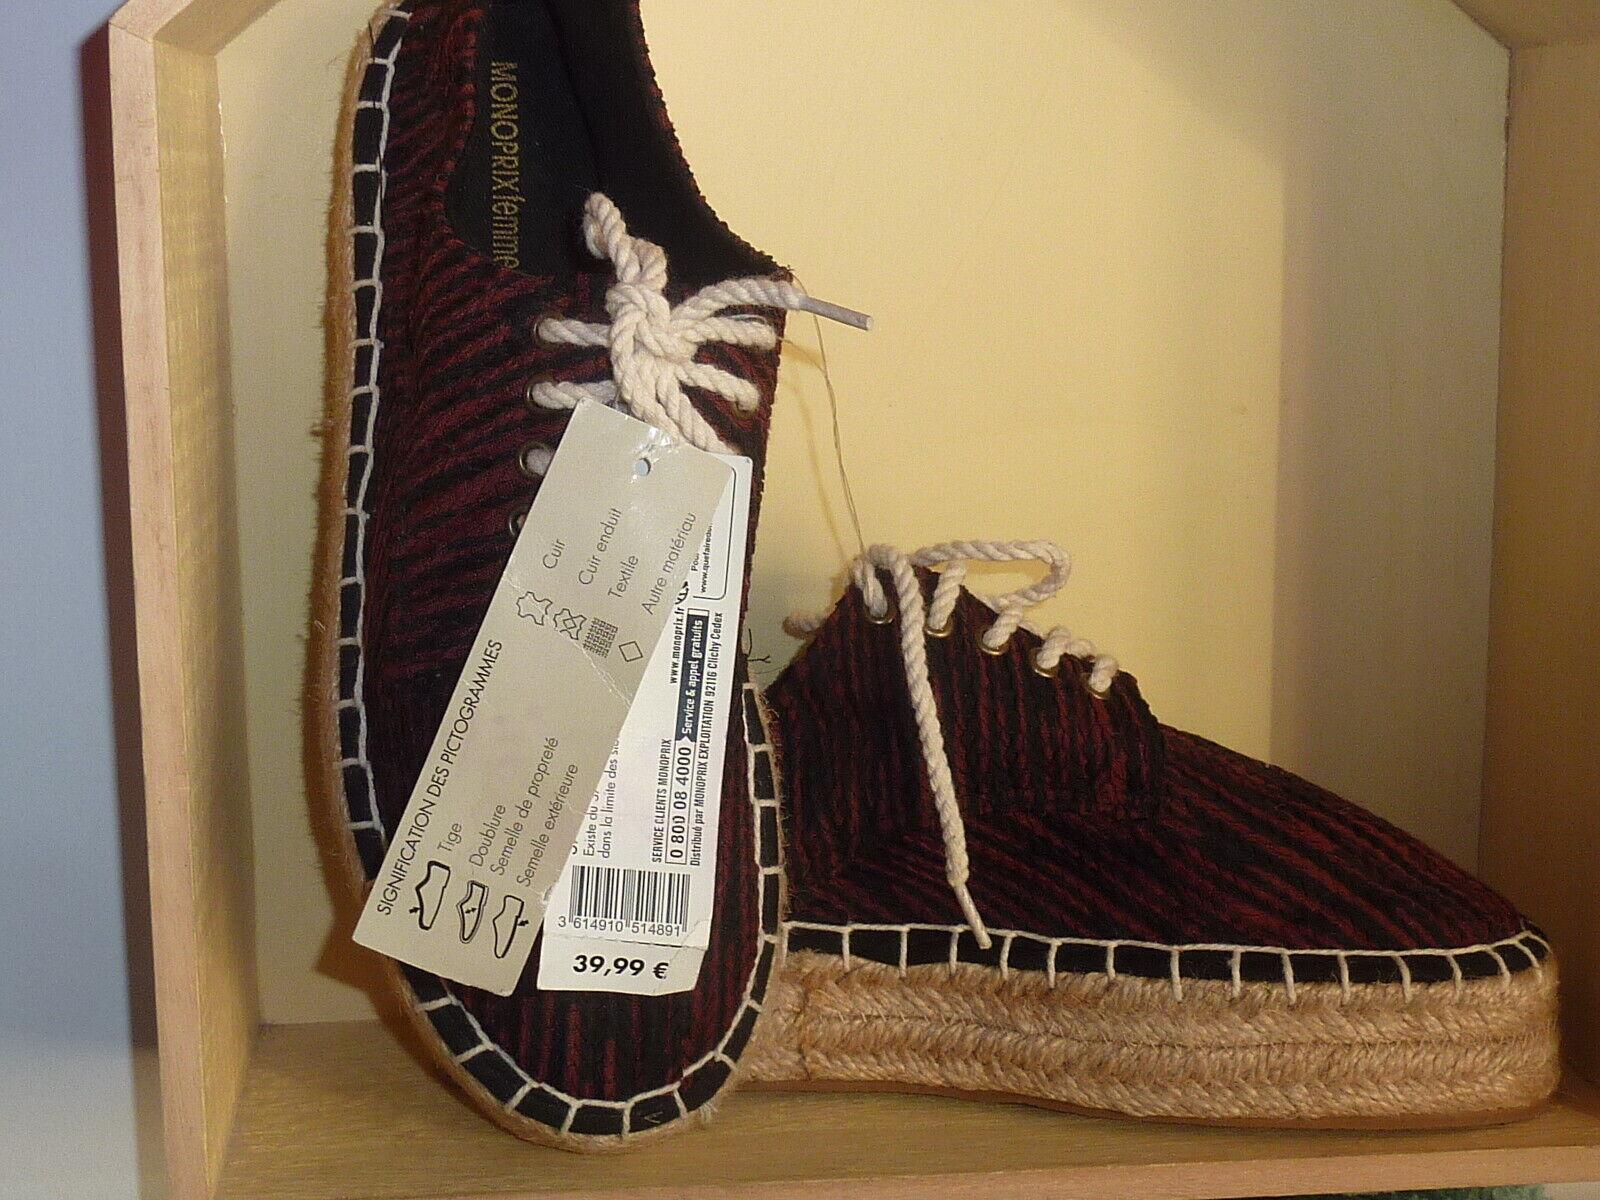 ♥ -70% ♥ Chaussures espadrilles MONOPRIX femme pointure 39 neuf valeur 40